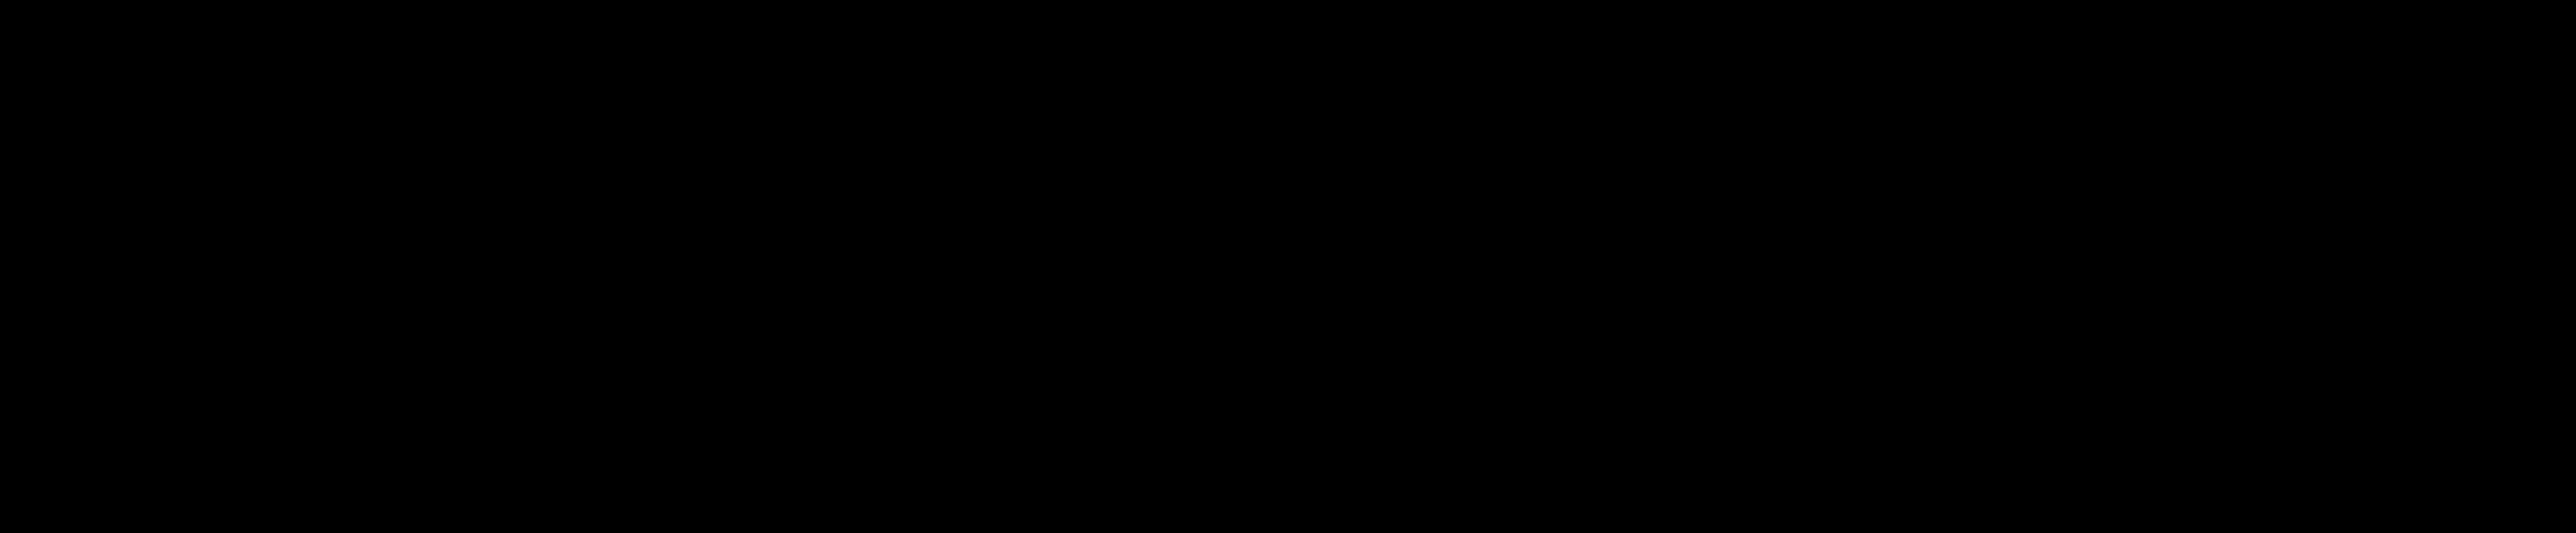 Playstation – Logos Download - PS5 Logo Transparent